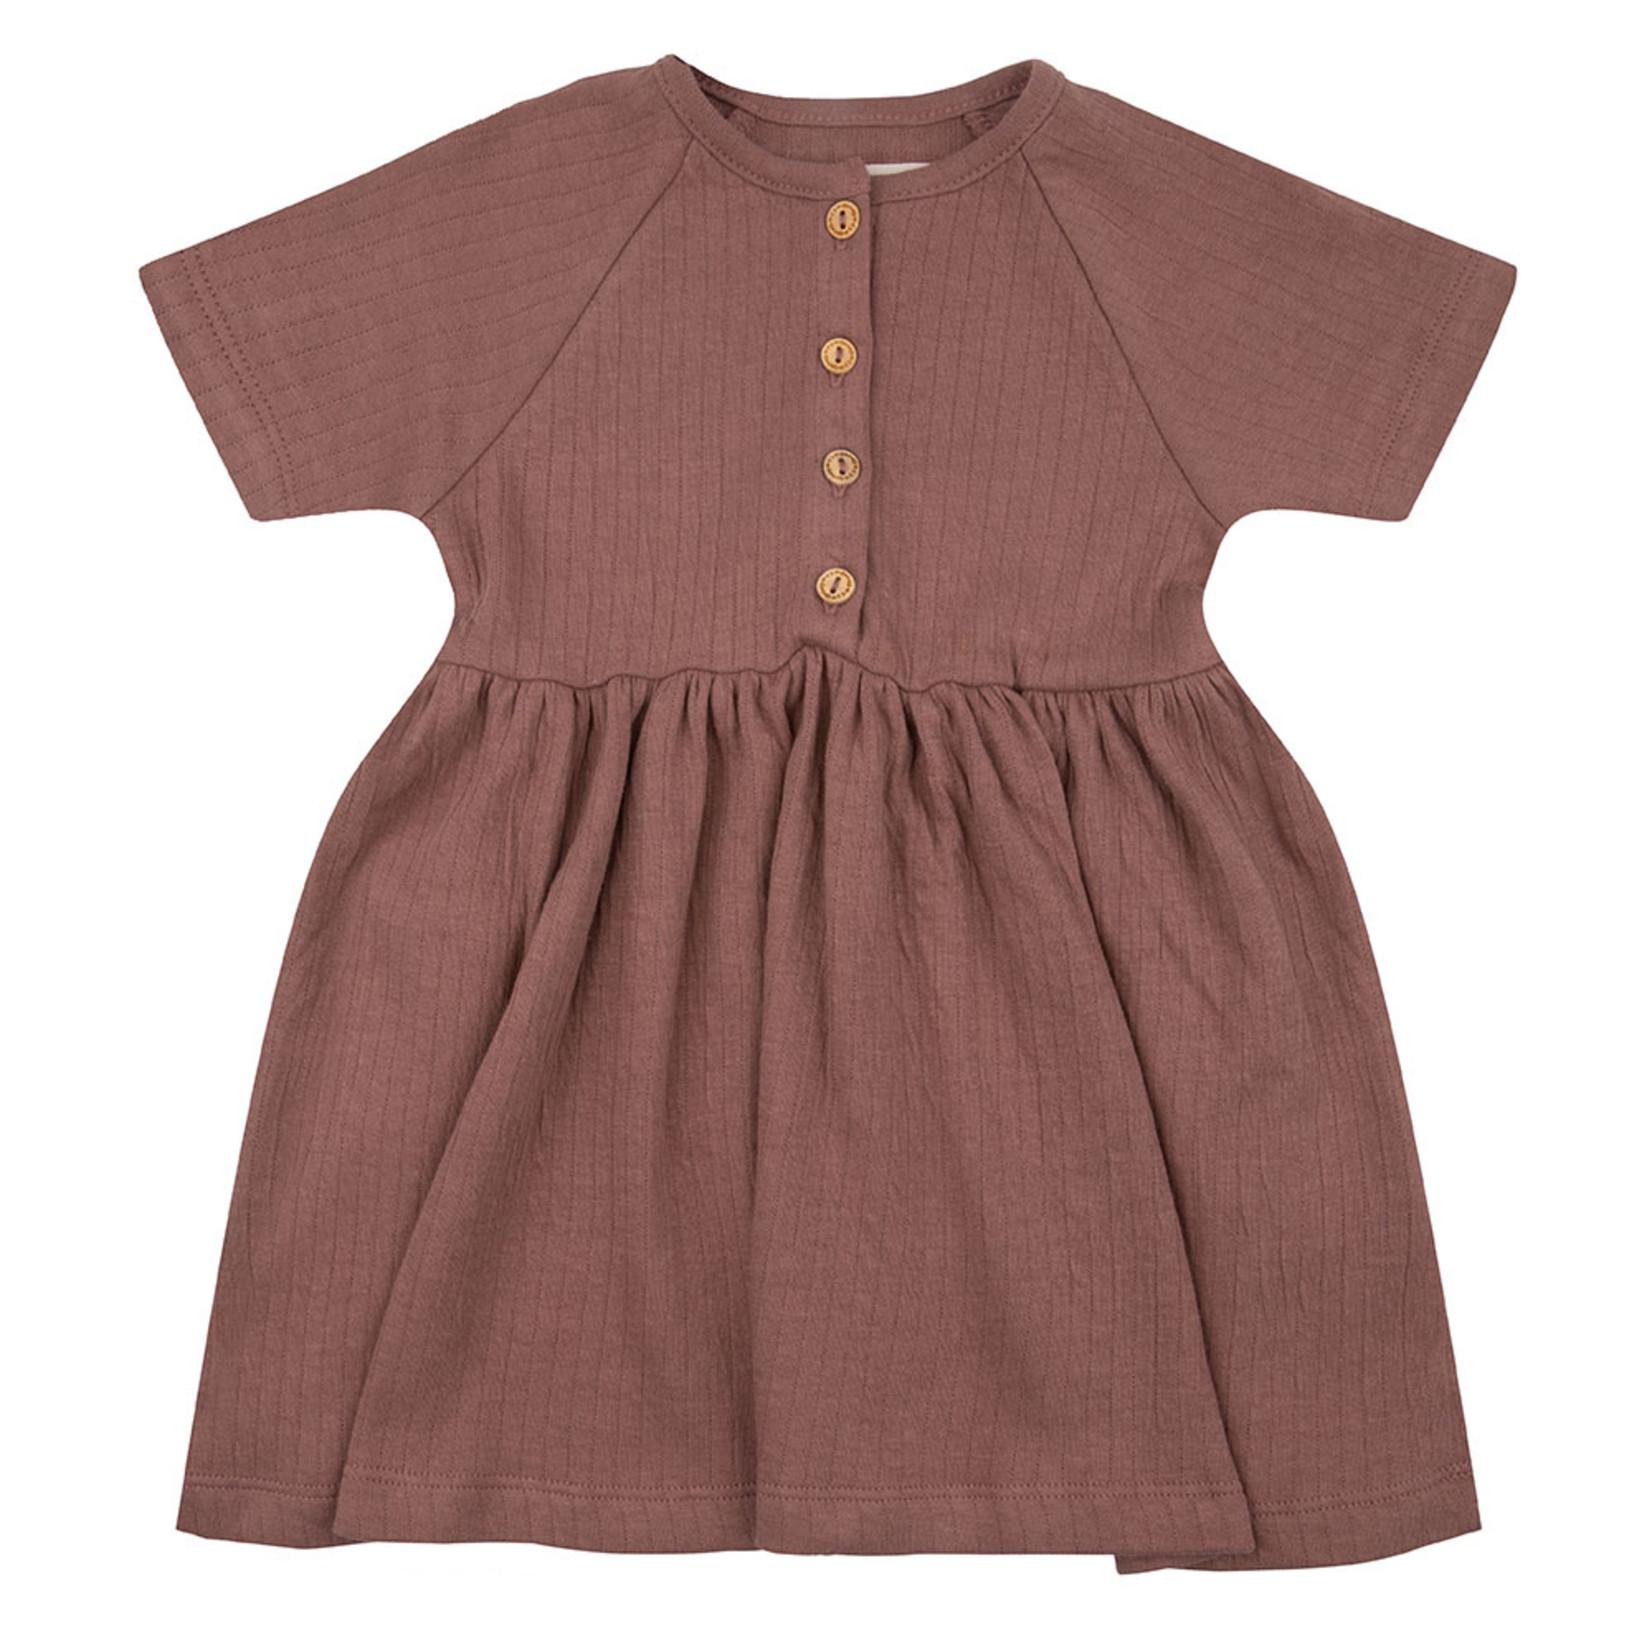 Little Indians Little Indians   Dress - Burlwood